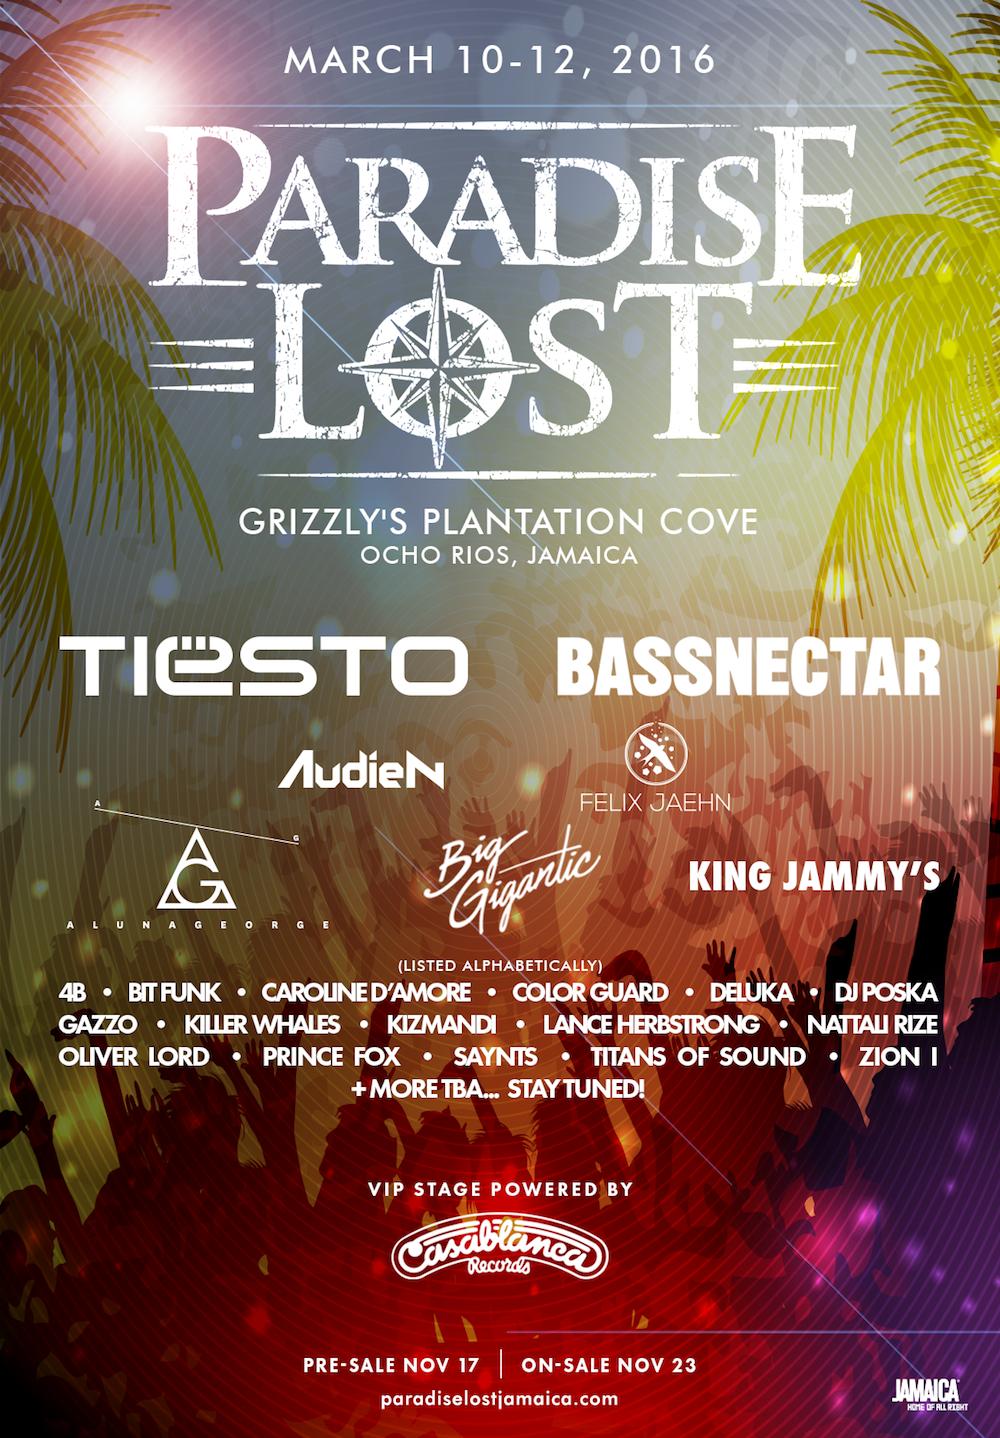 assnectar @ Paradise Lost 2016